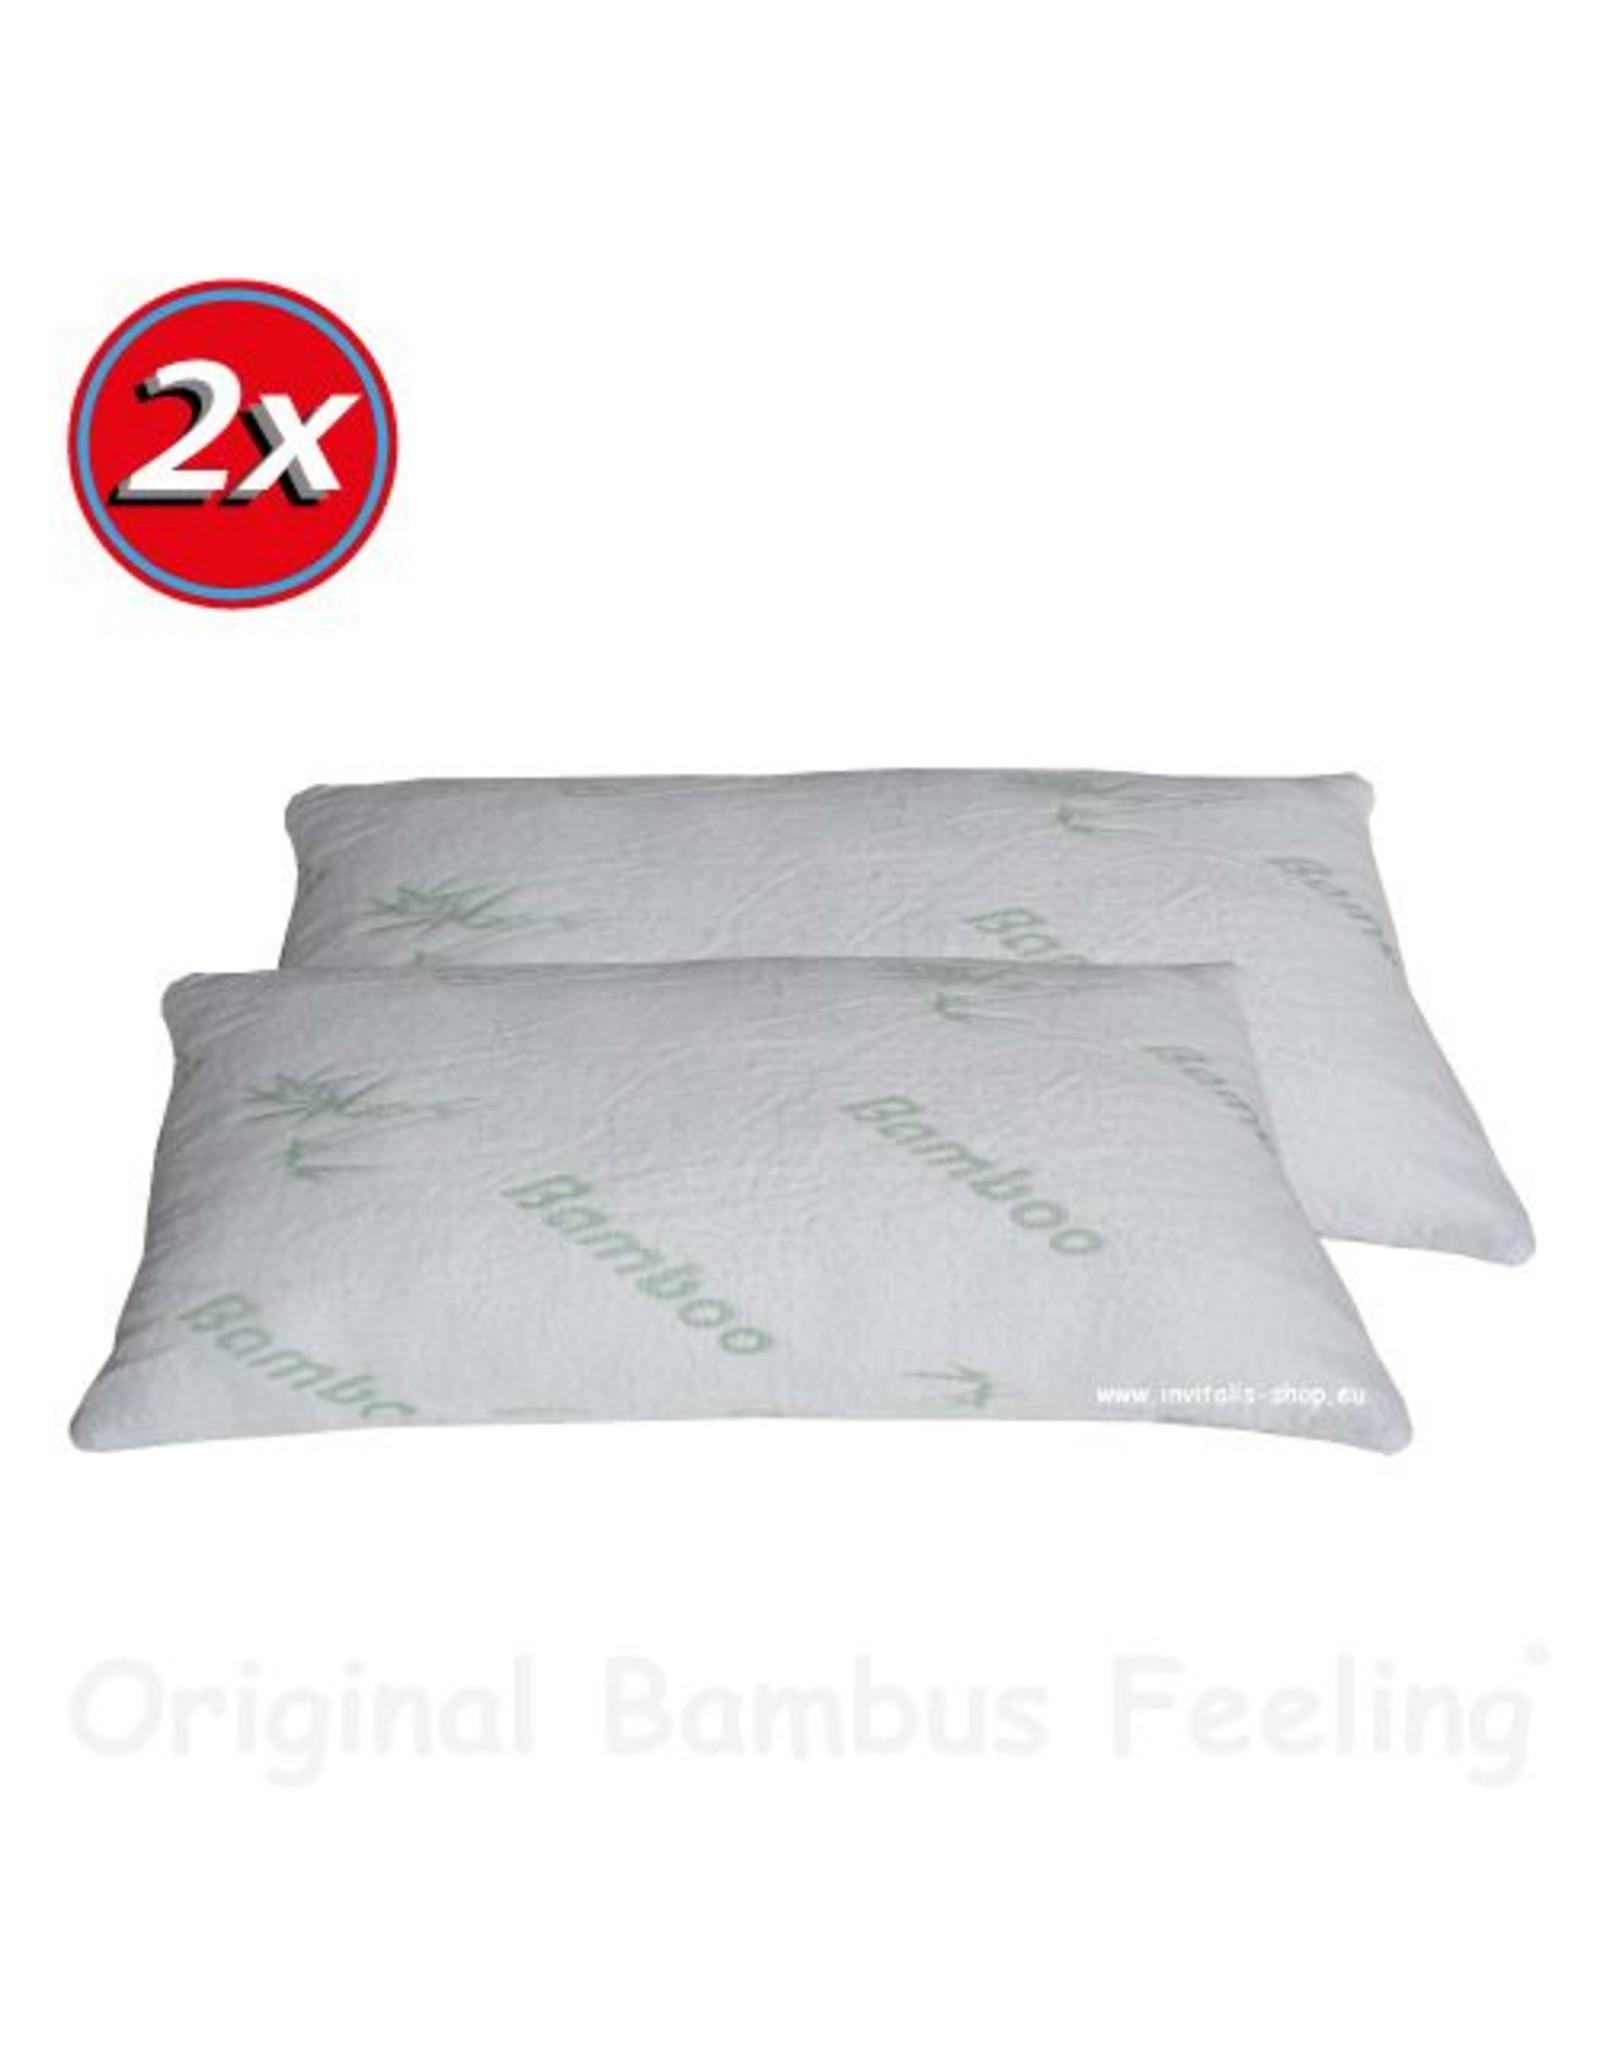 Bamboo-Pillow - 80x40cm 2 pcs Value-Set